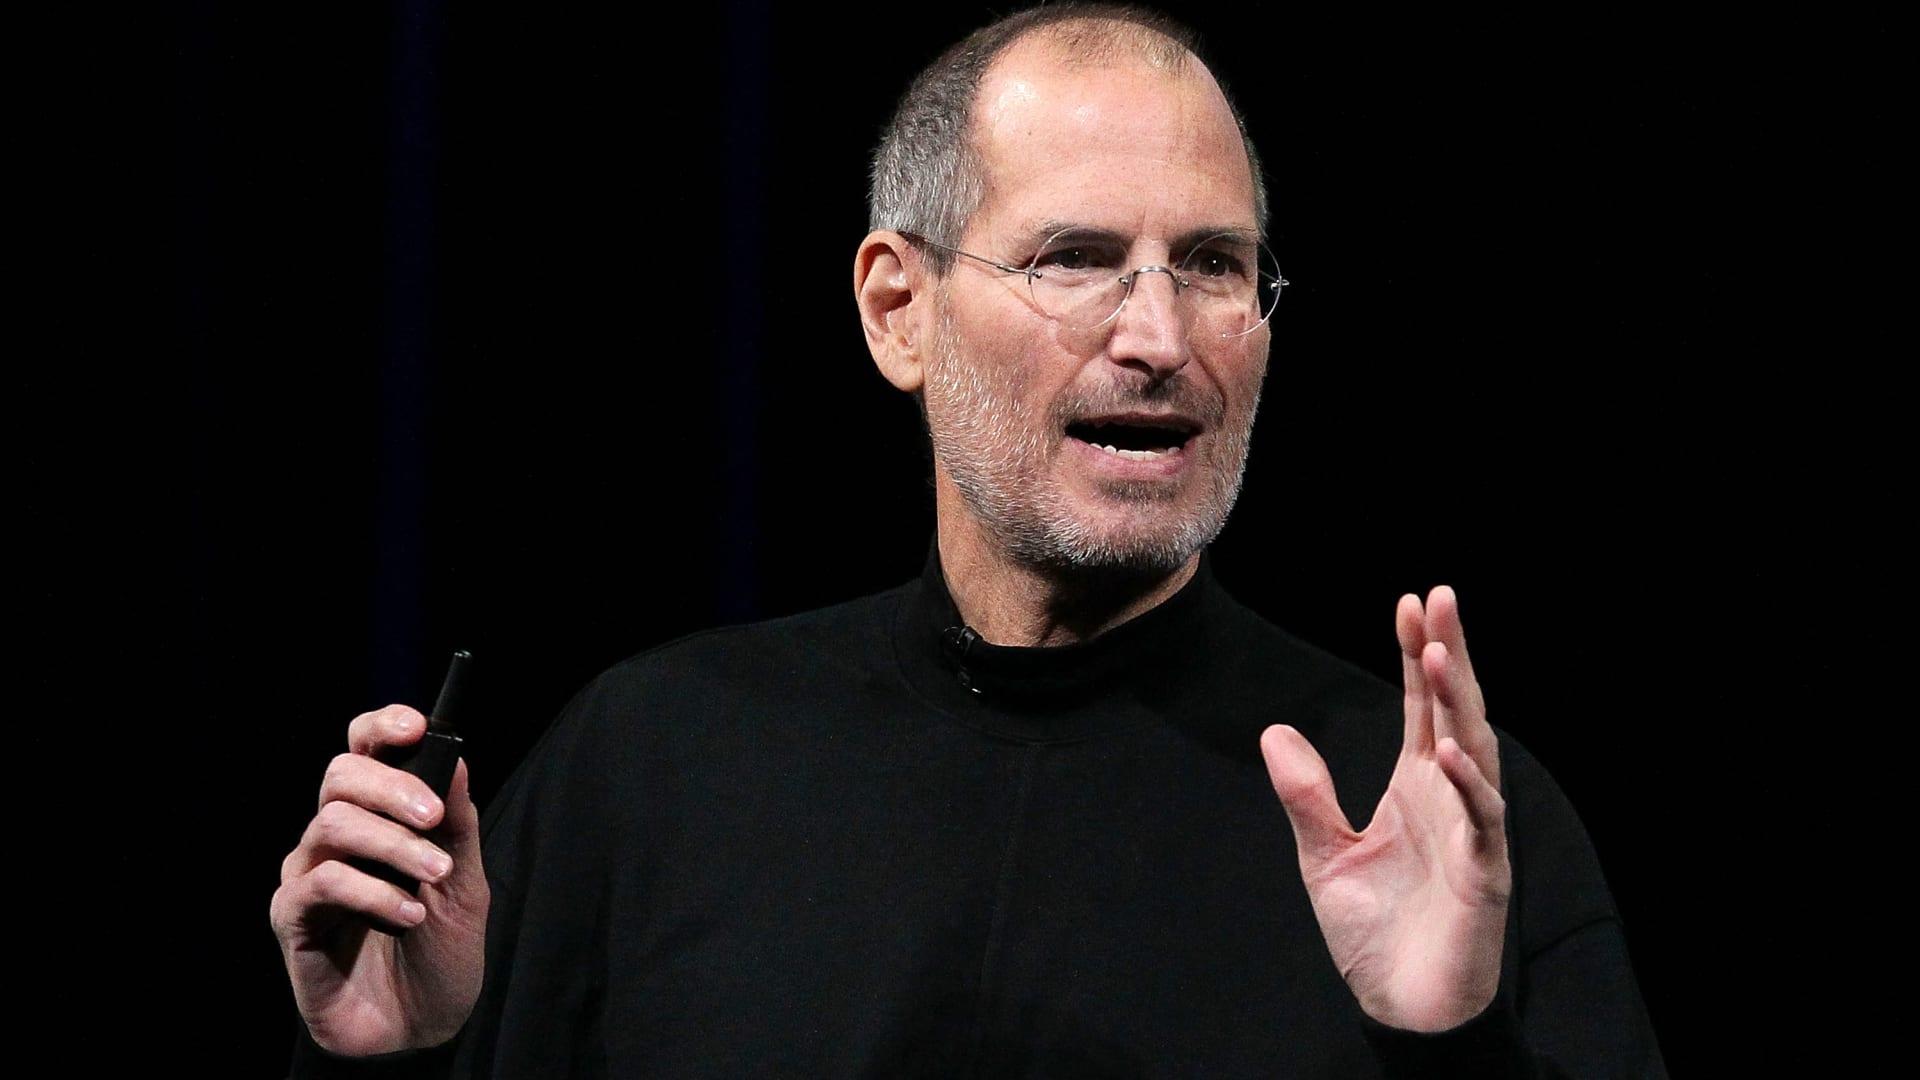 Apple Inc.'s former CEO, the late Steve Jobs, announces the new iPad on January 27, 2010 in San Francisco, California.